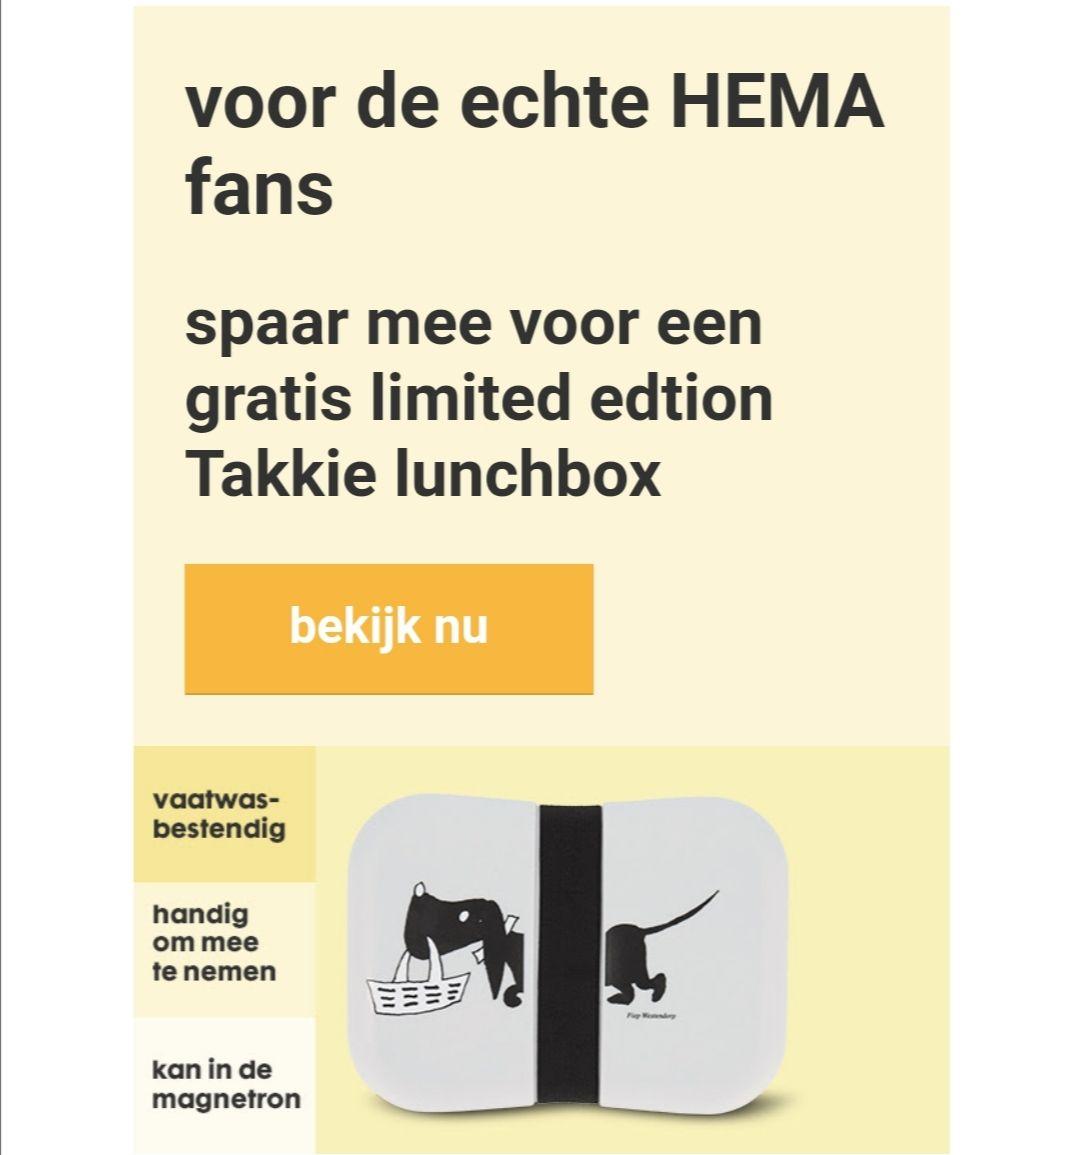 Gratis limited edition Takkie lunchbox tegen inlevering van 200 HEMA punten